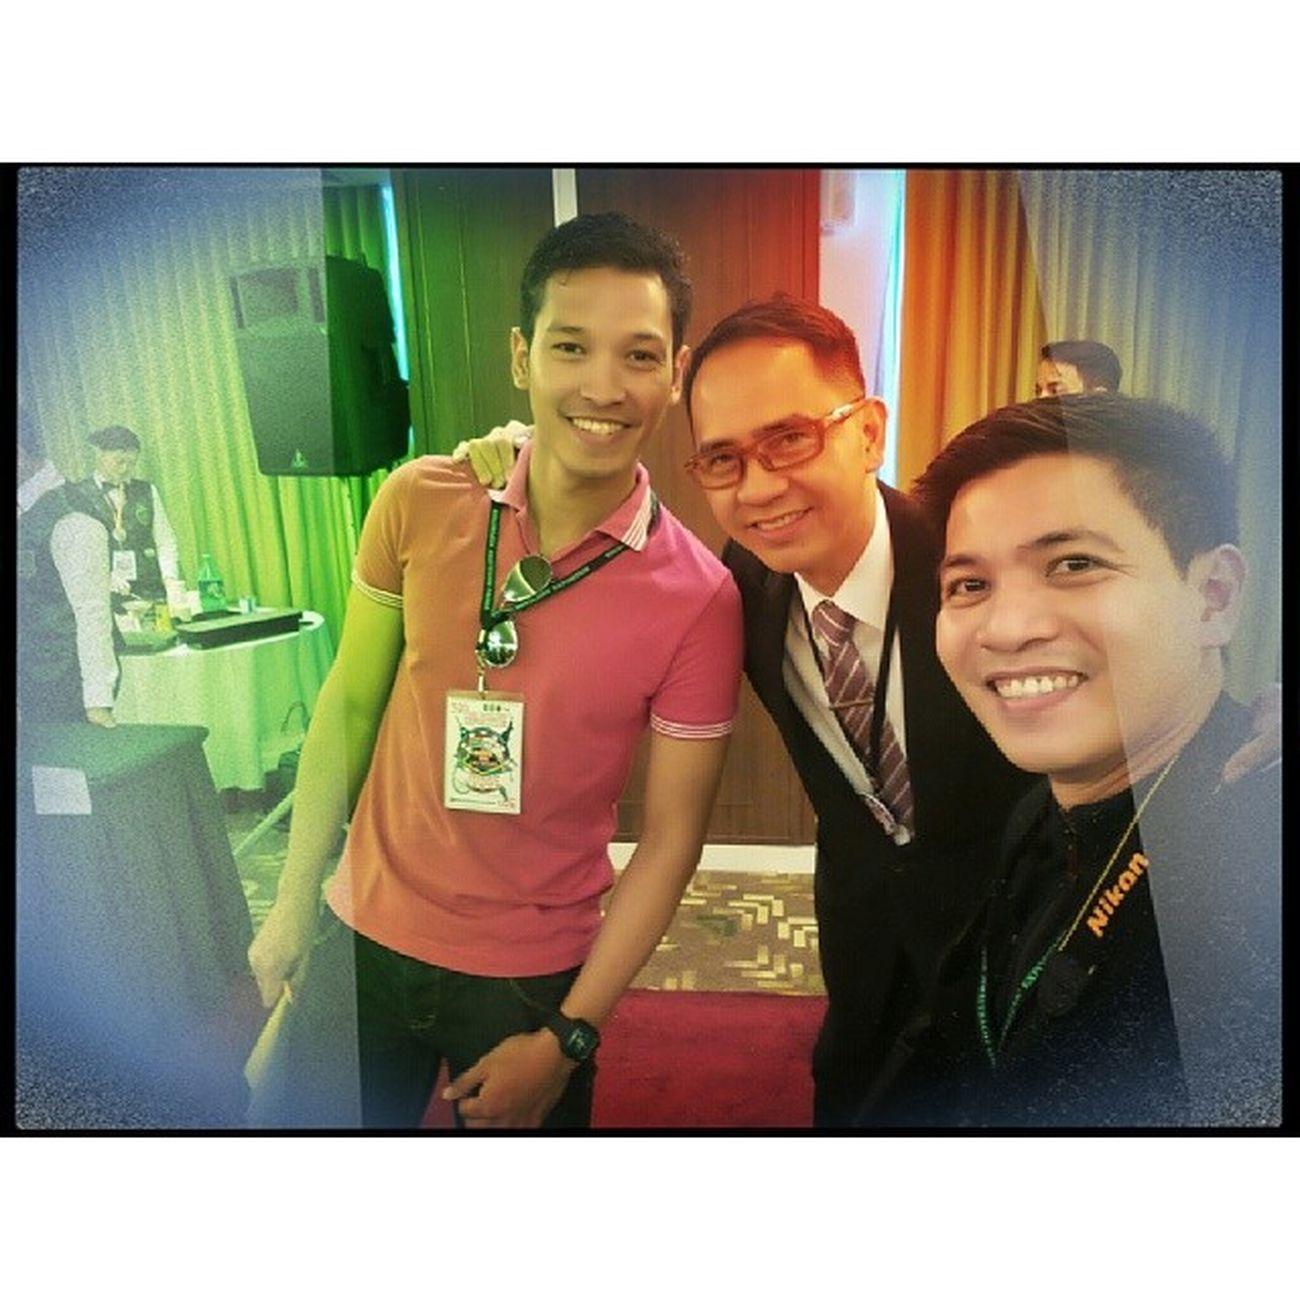 With mocktail competition judge @gioloracelis and Mr. Ele 39thYHE Benilde 39thYHEgoesVivaLasVegas YHE younghoteliersexposition themanansala selfie